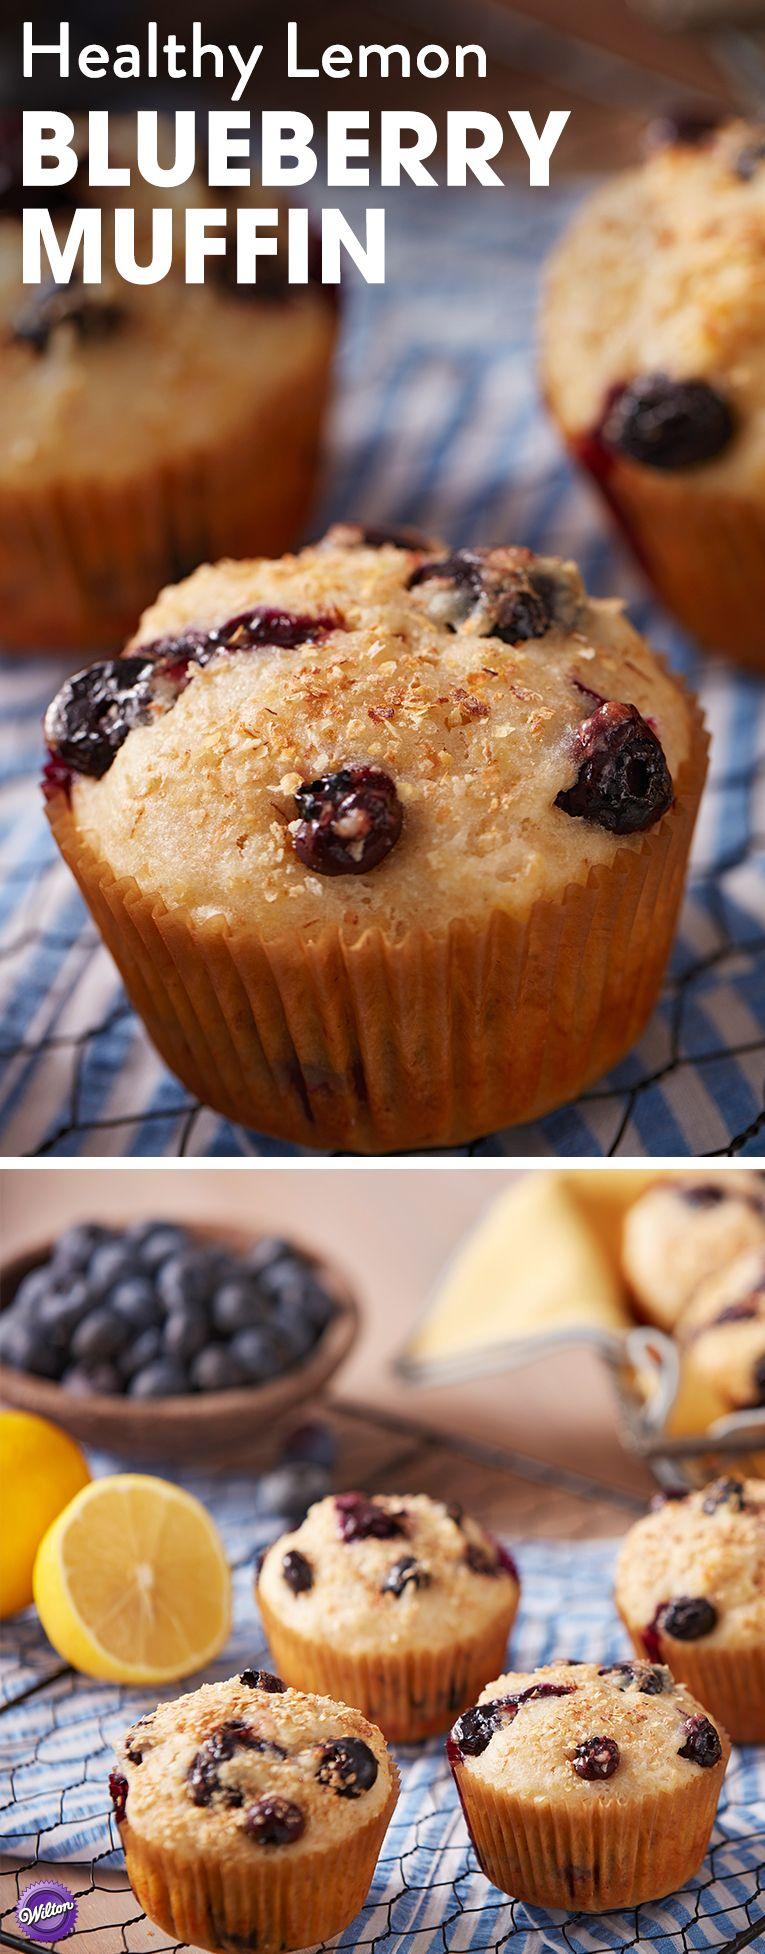 Healthier Lemon Blueberry Muffins Recipe Lemon Blueberry Muffins Recipe Low Carb Breakfast Dessert Recipes